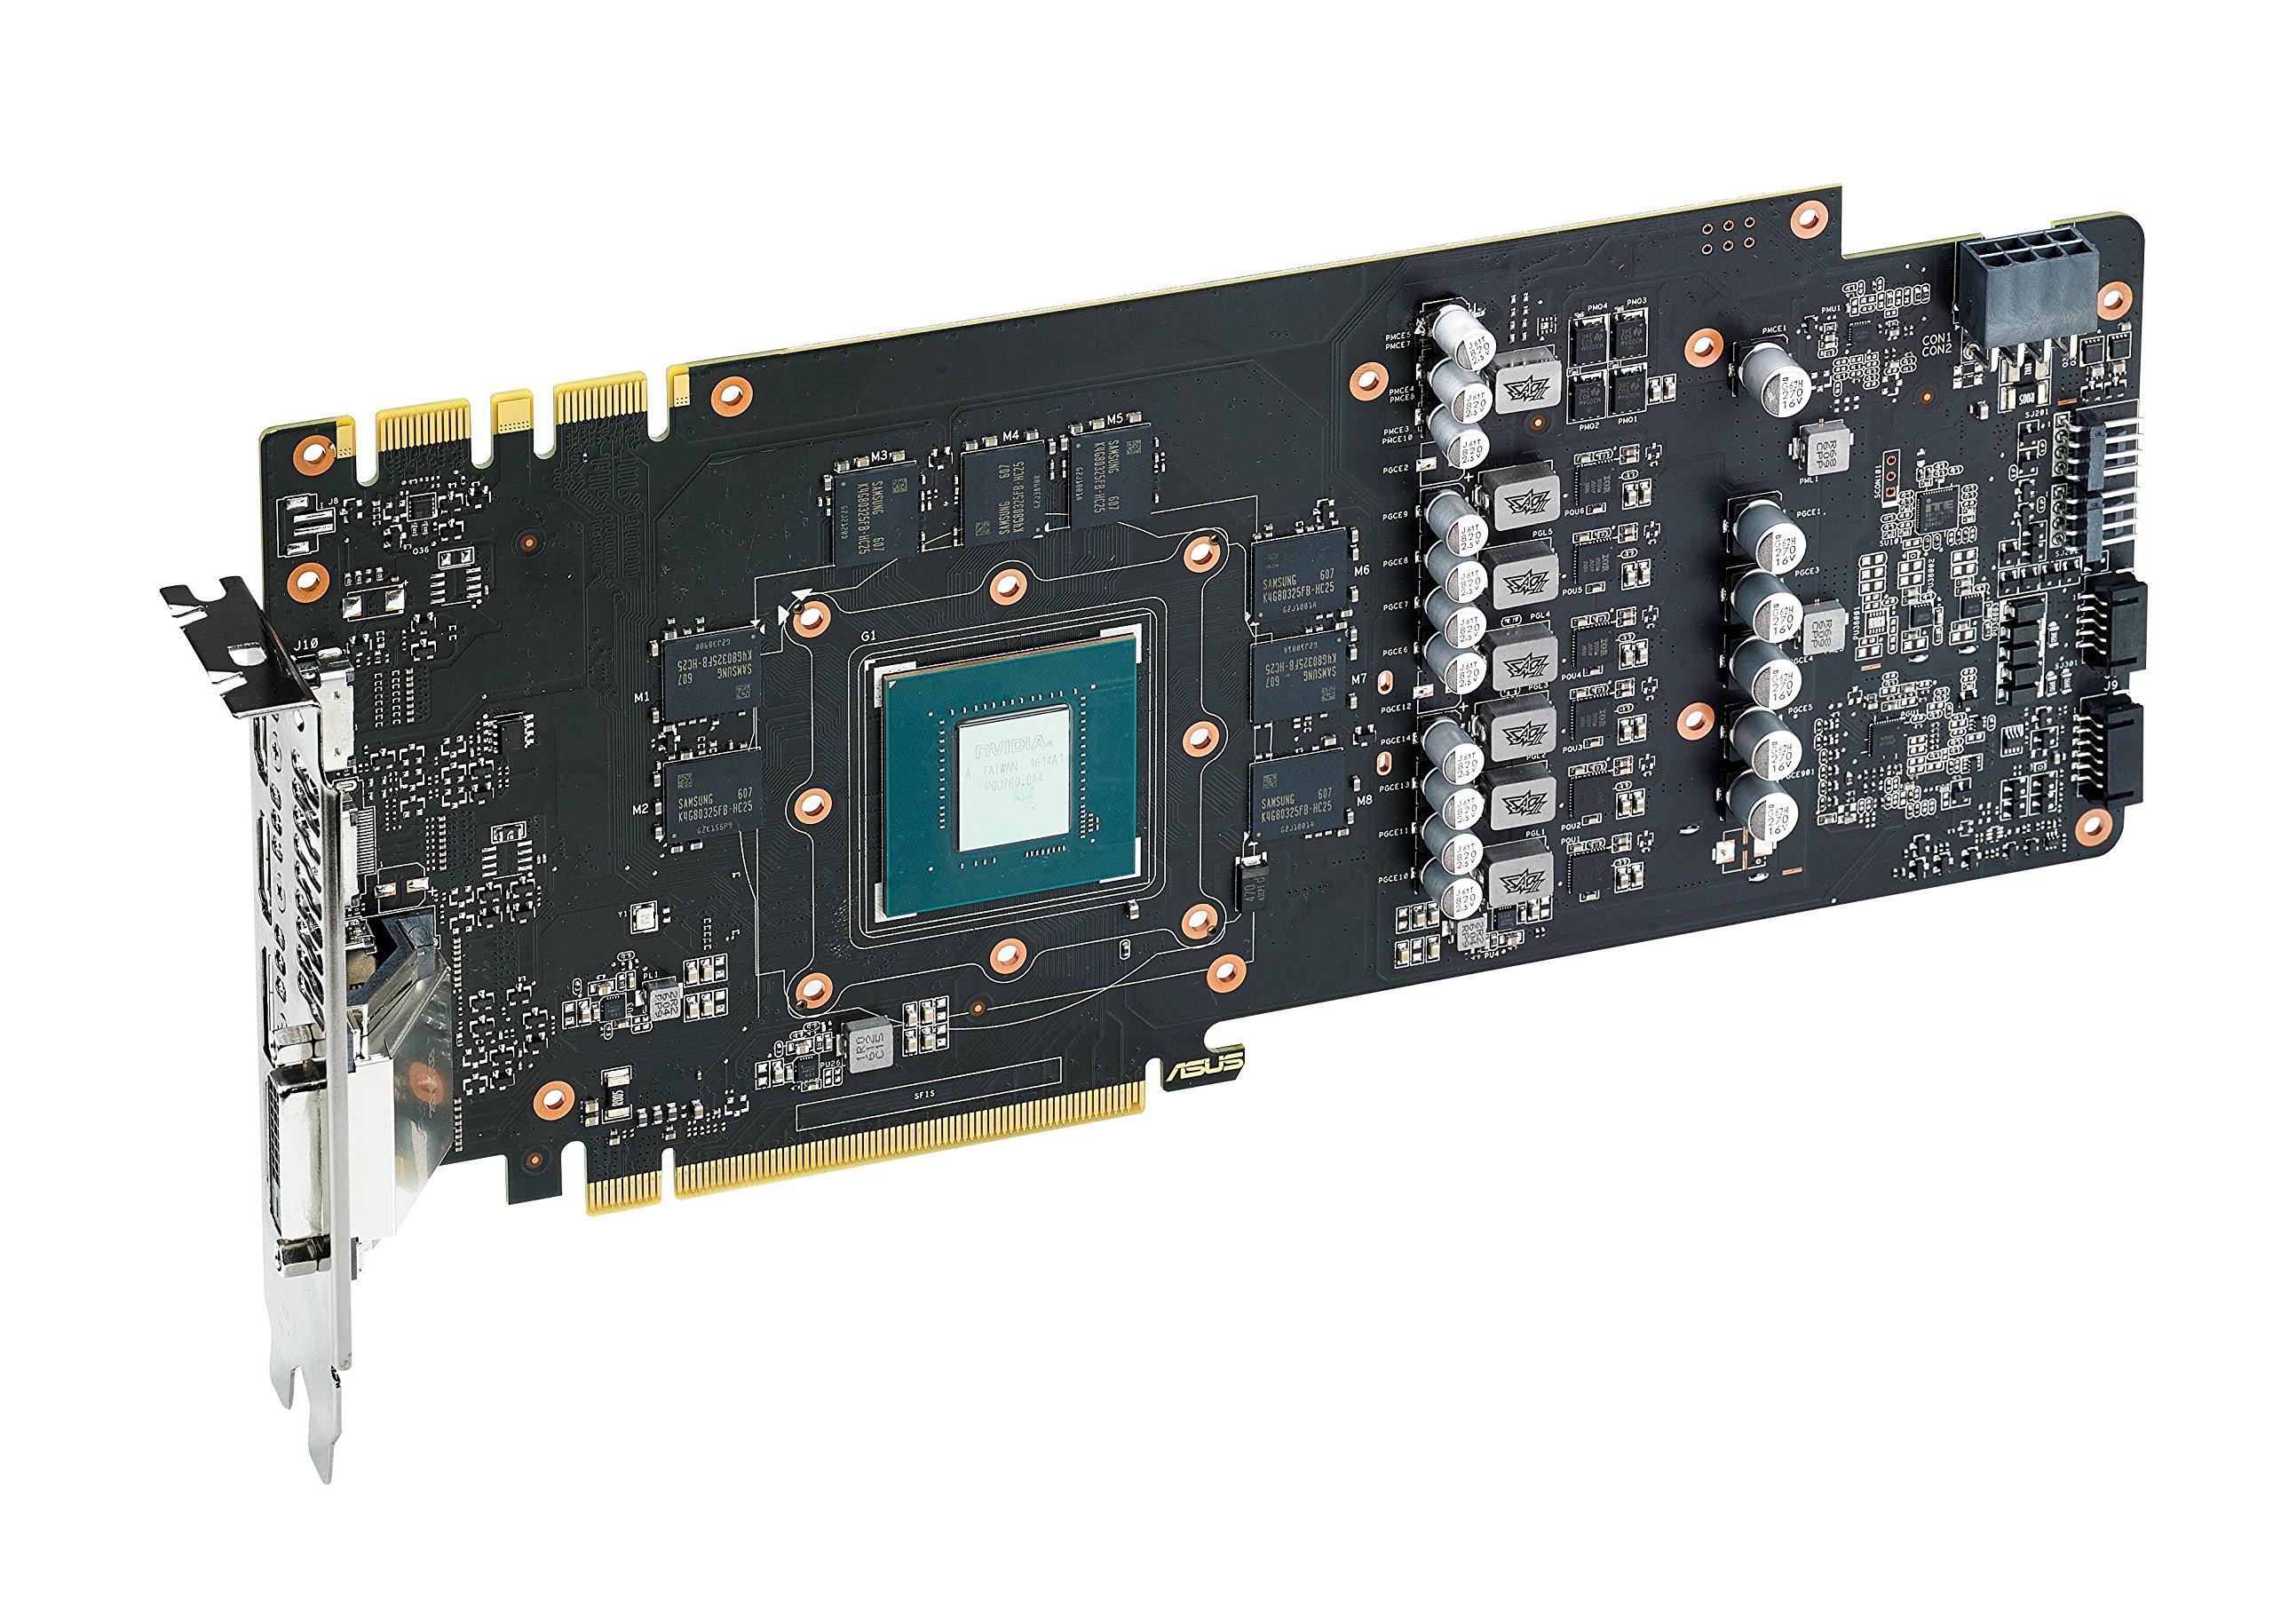 ASUS GeForce GTX 1070 8GB ROG STRIX OC Edition Graphic Card STRIX-GTX1070-O8G-GAMING by Asus (Image #6)